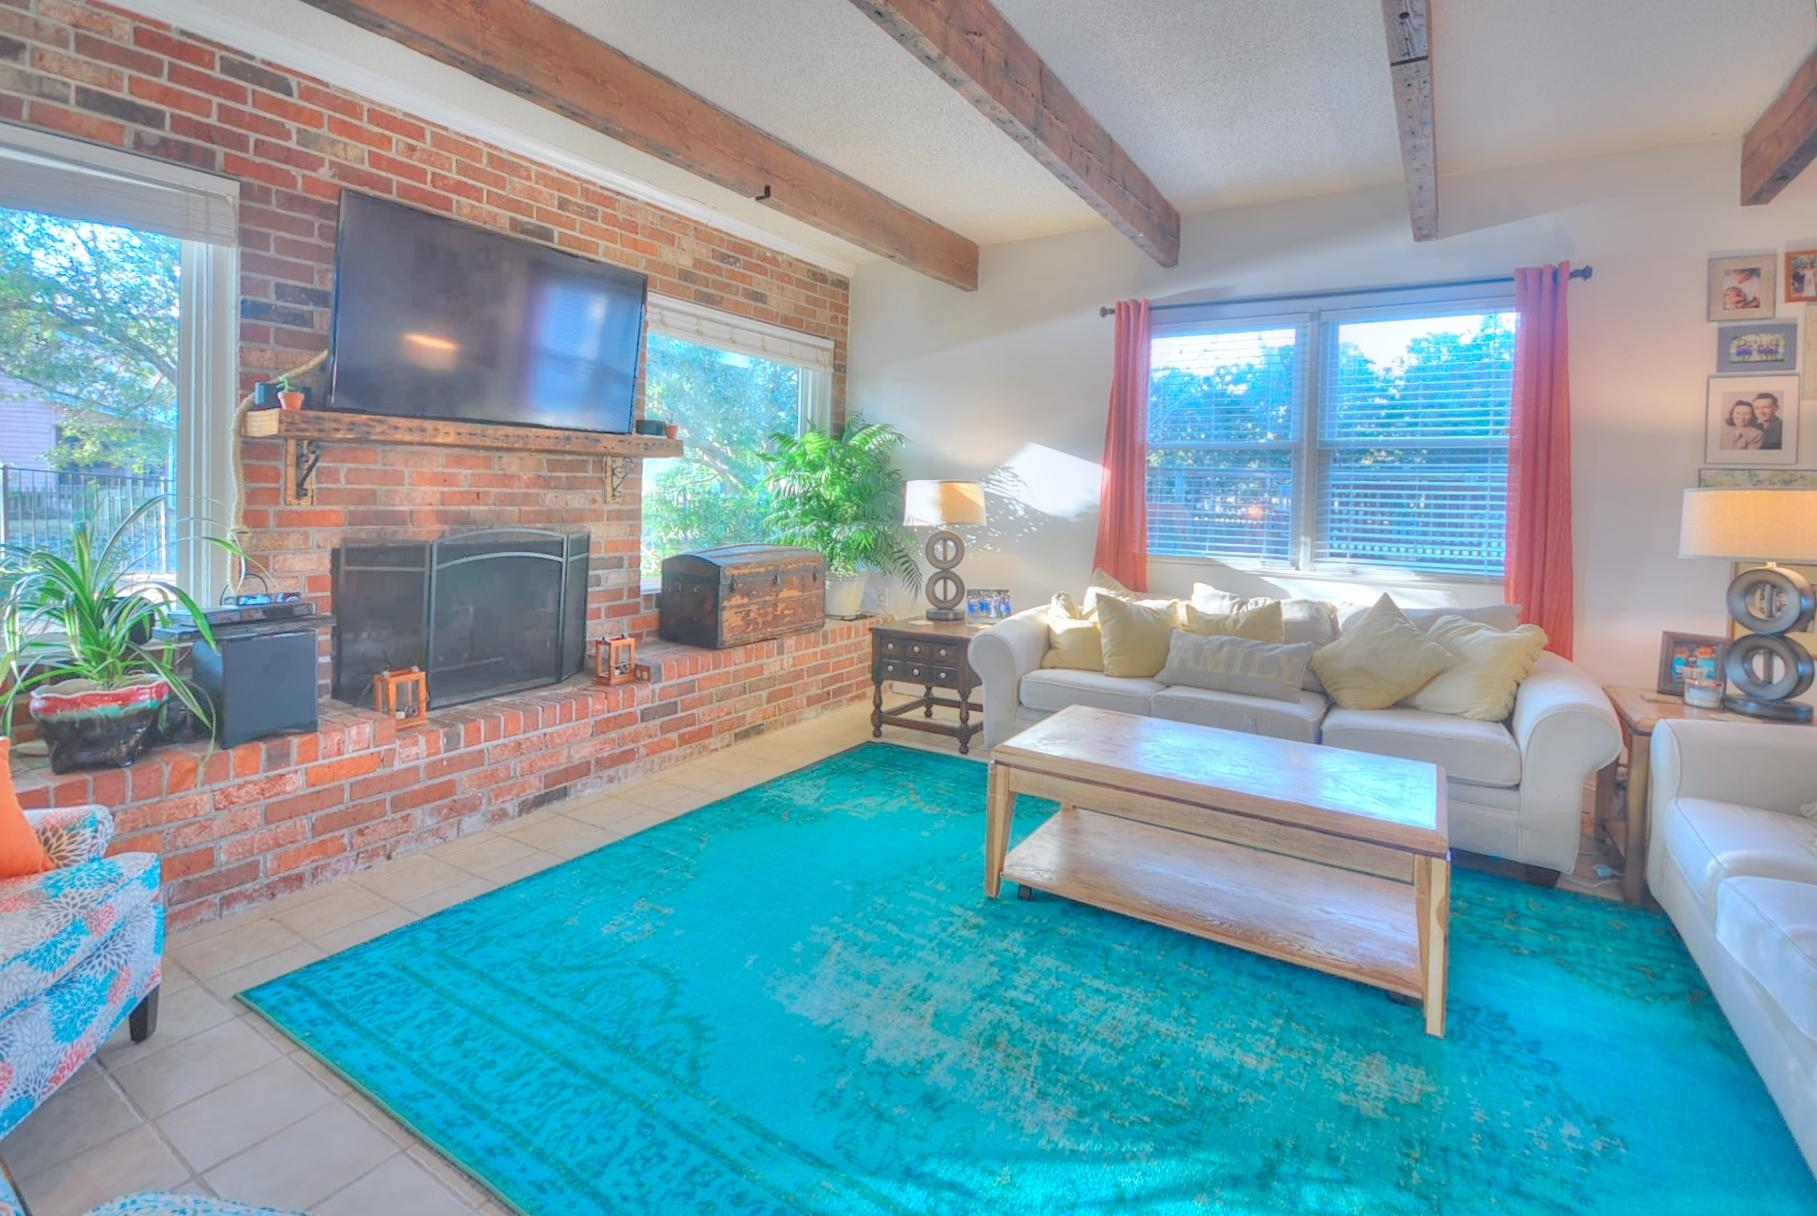 Capri Isles Homes For Sale - 213 Wappoo, Charleston, SC - 28